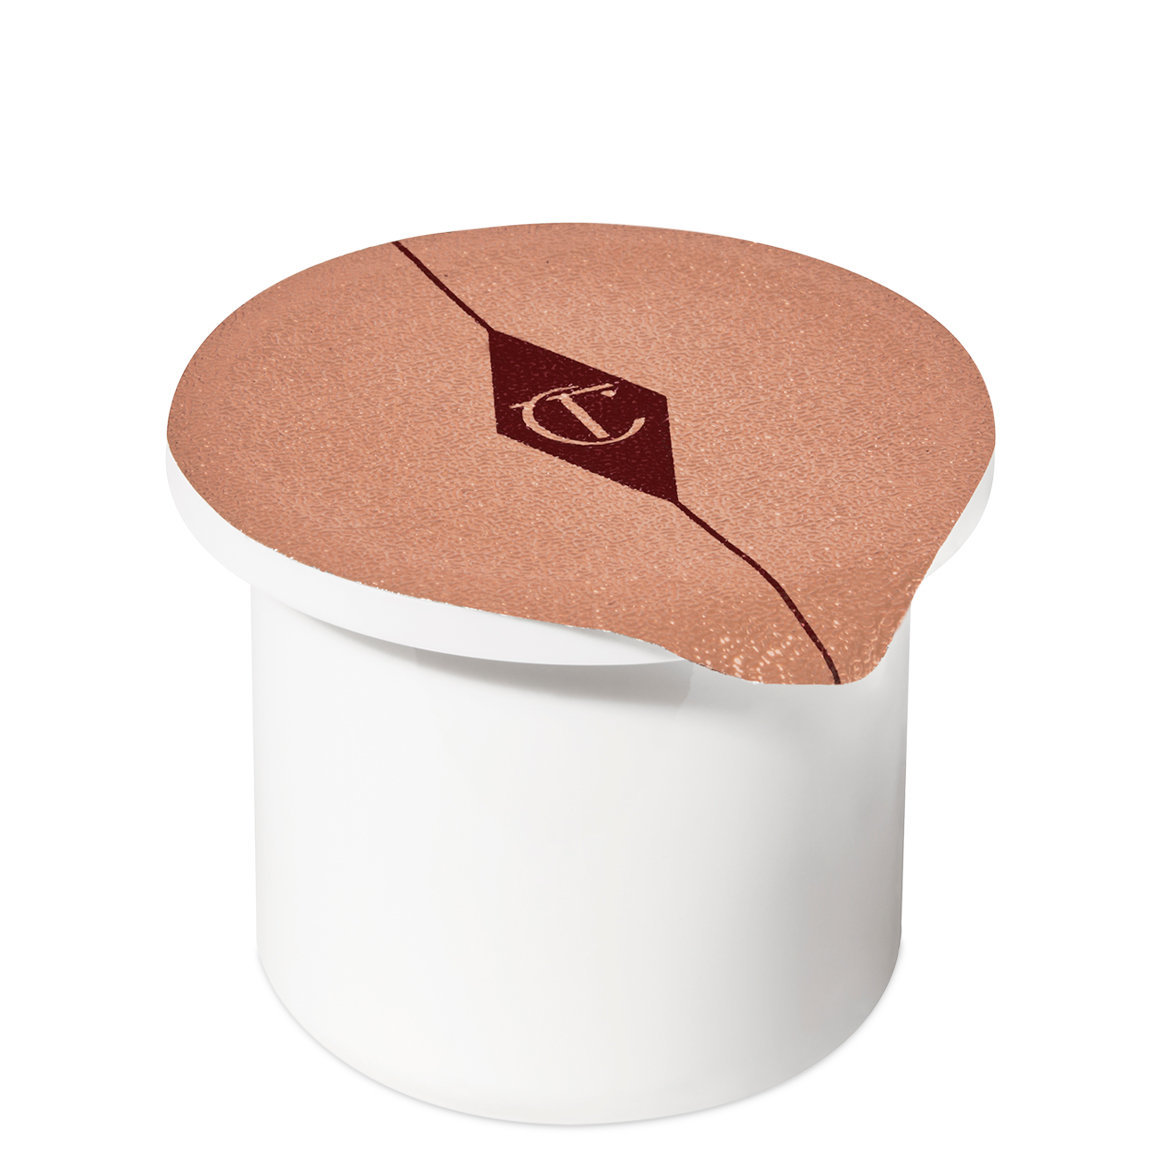 Charlotte Tilbury Charlotte's Magic Cream Refill alternative view 1 - product swatch.